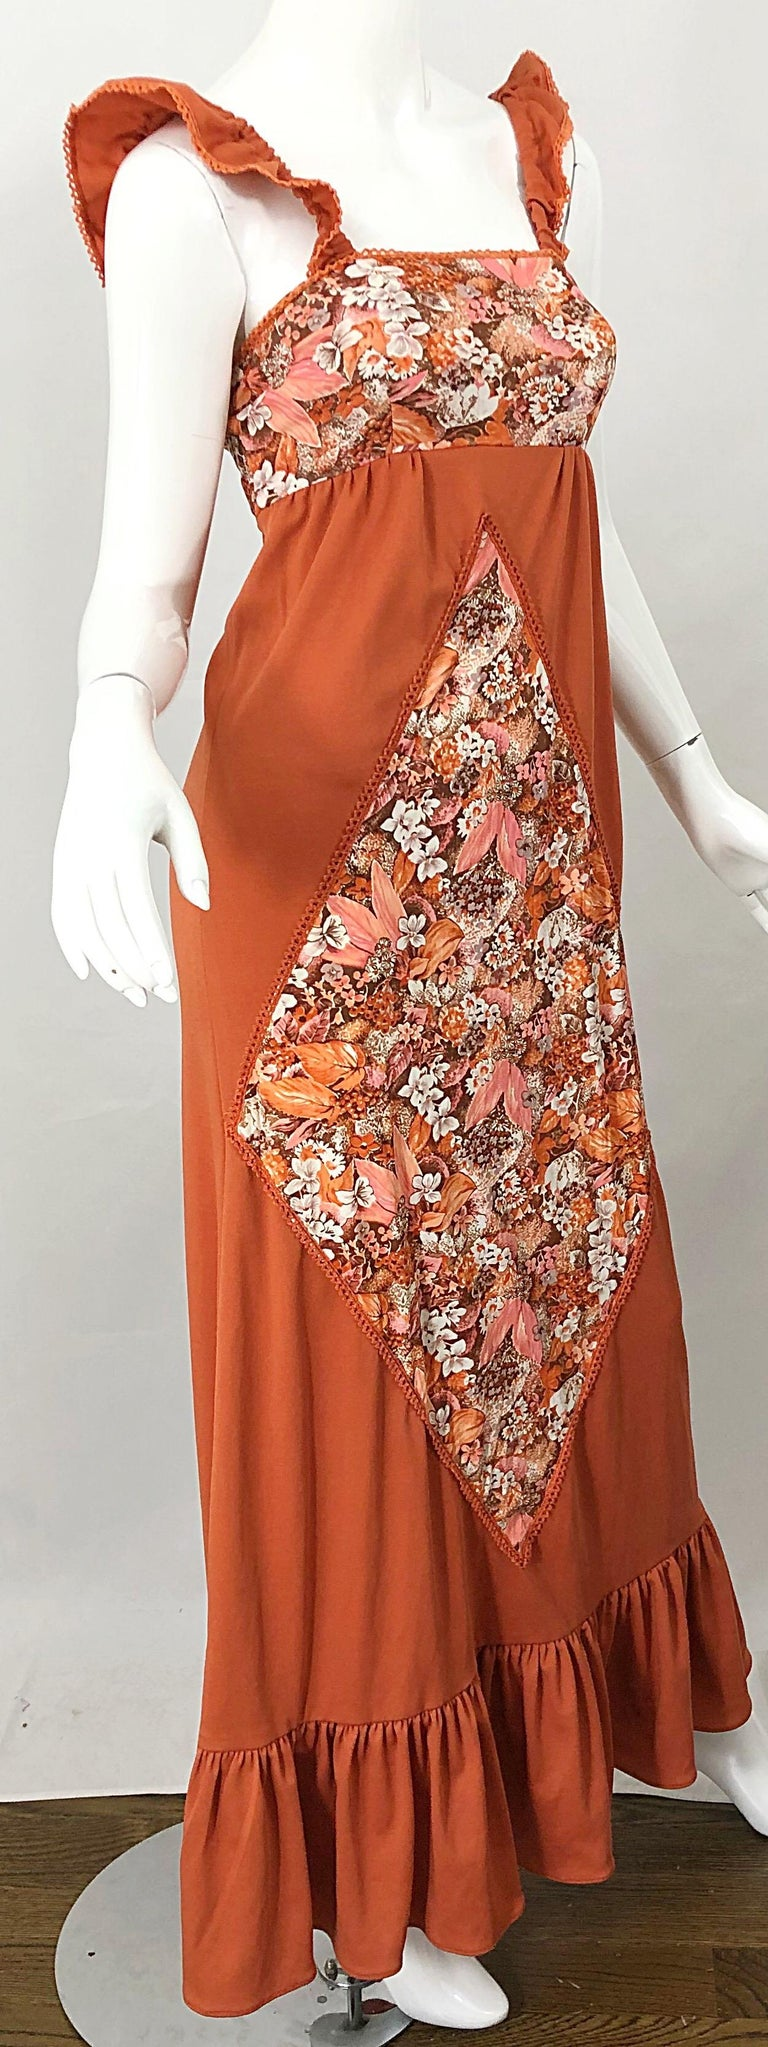 1970s Burnt Orange Patchwork Flowers Boho Vintage 70s Jersey Autumnal Maxi Dress For Sale 7